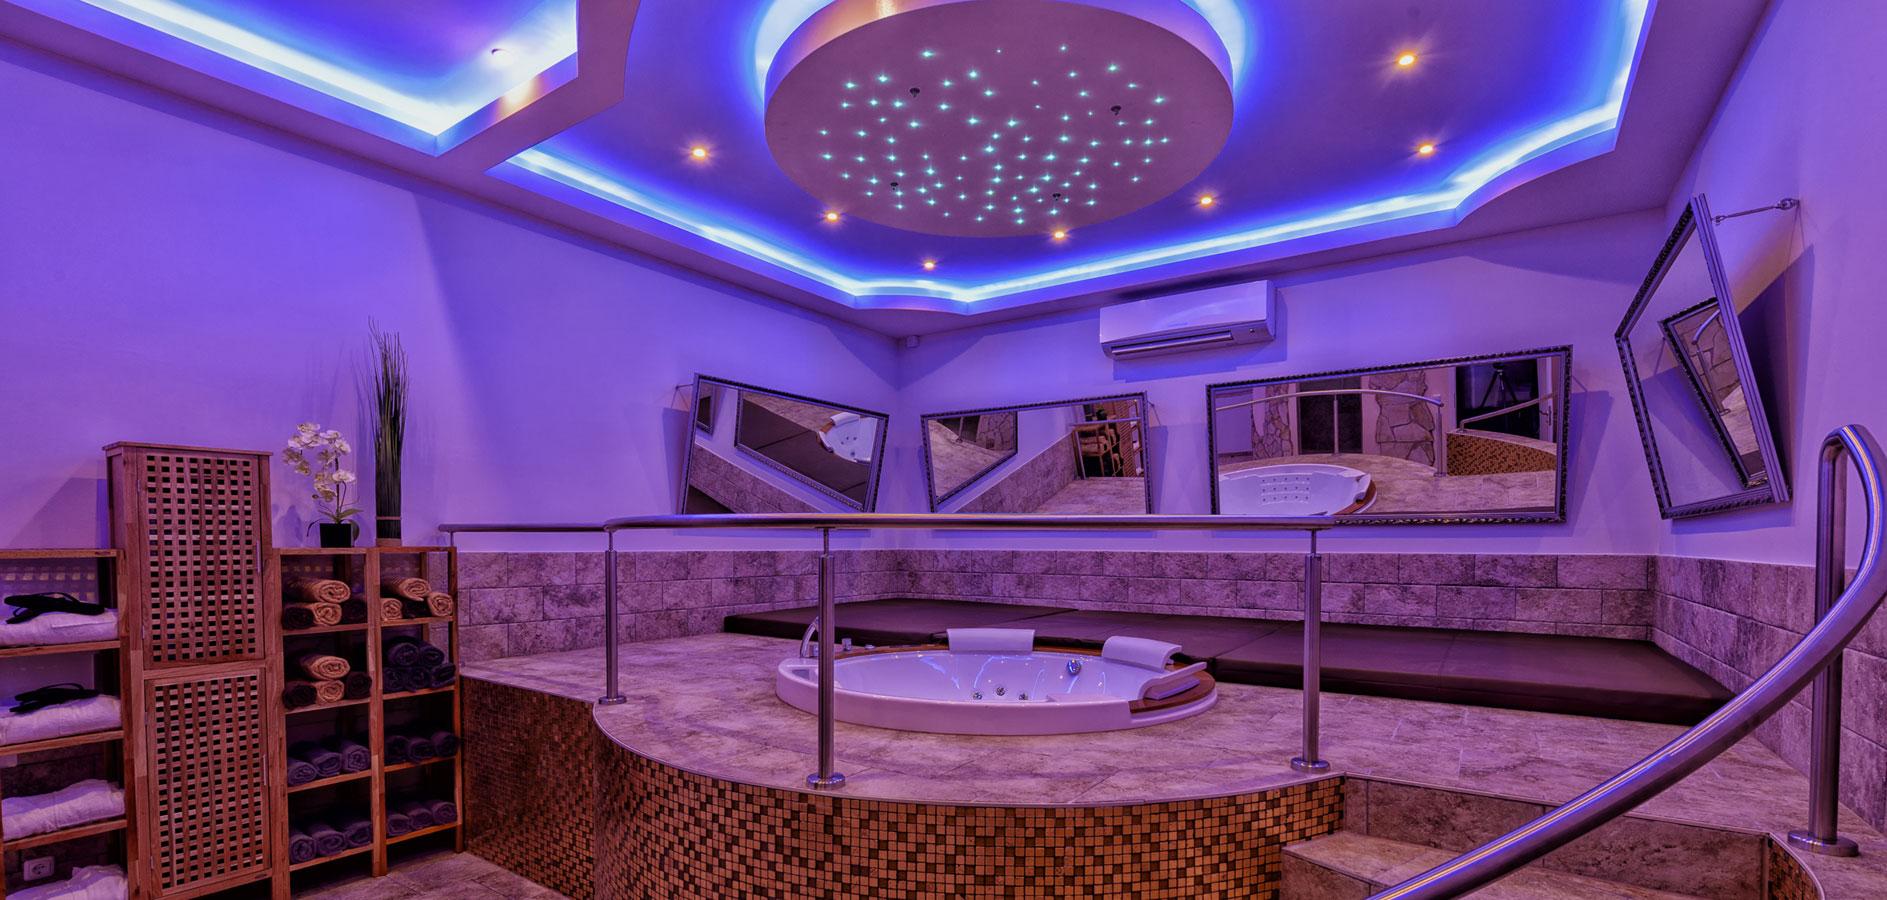 whirlpool suite casaamore. Black Bedroom Furniture Sets. Home Design Ideas